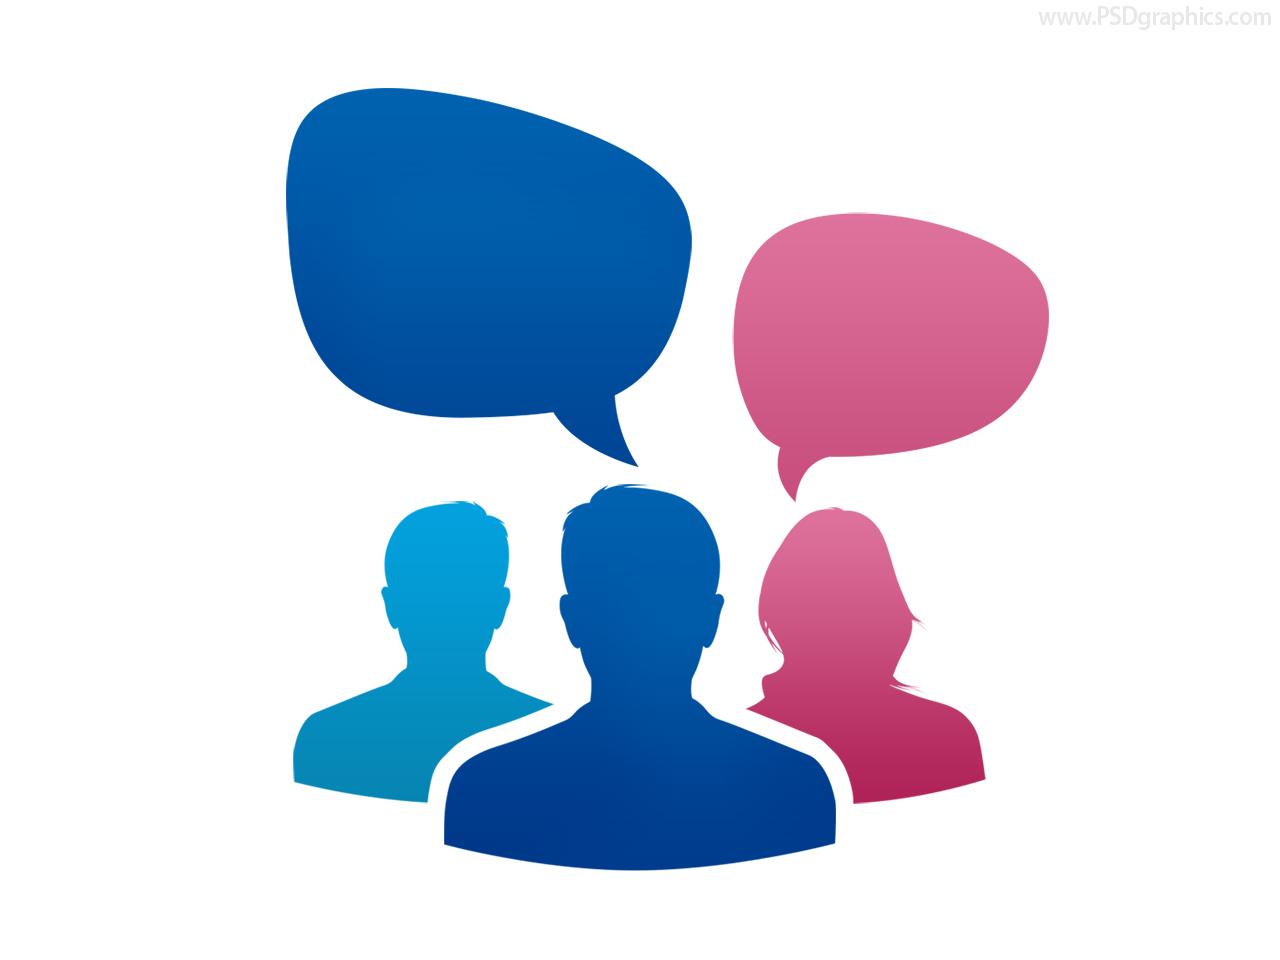 Team conversation icon (PSD) | PSDGraphics